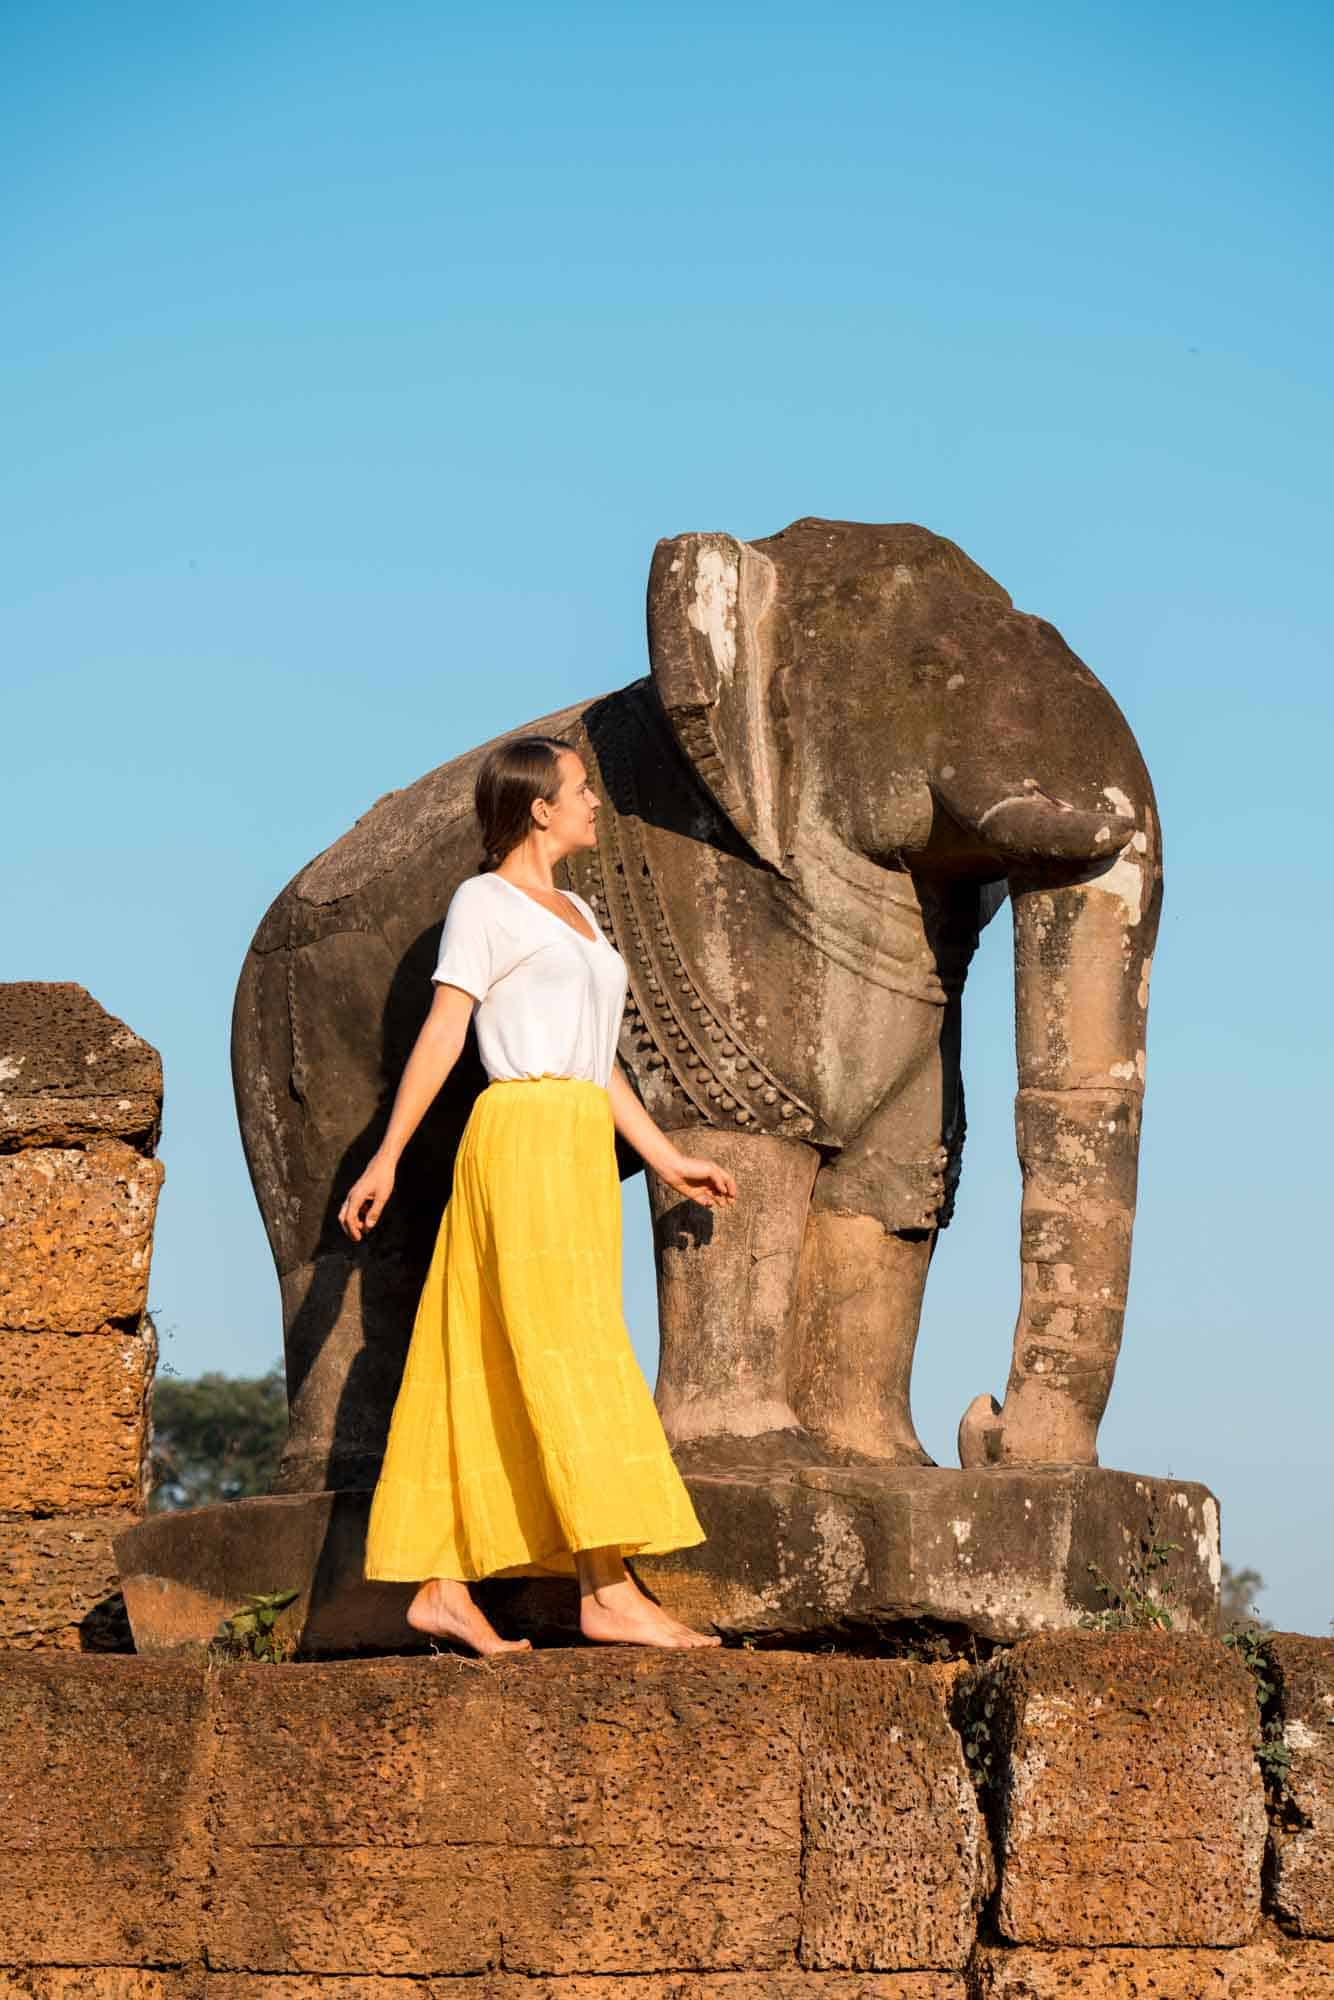 7:10am - Golden light on the elephants of East Mebon